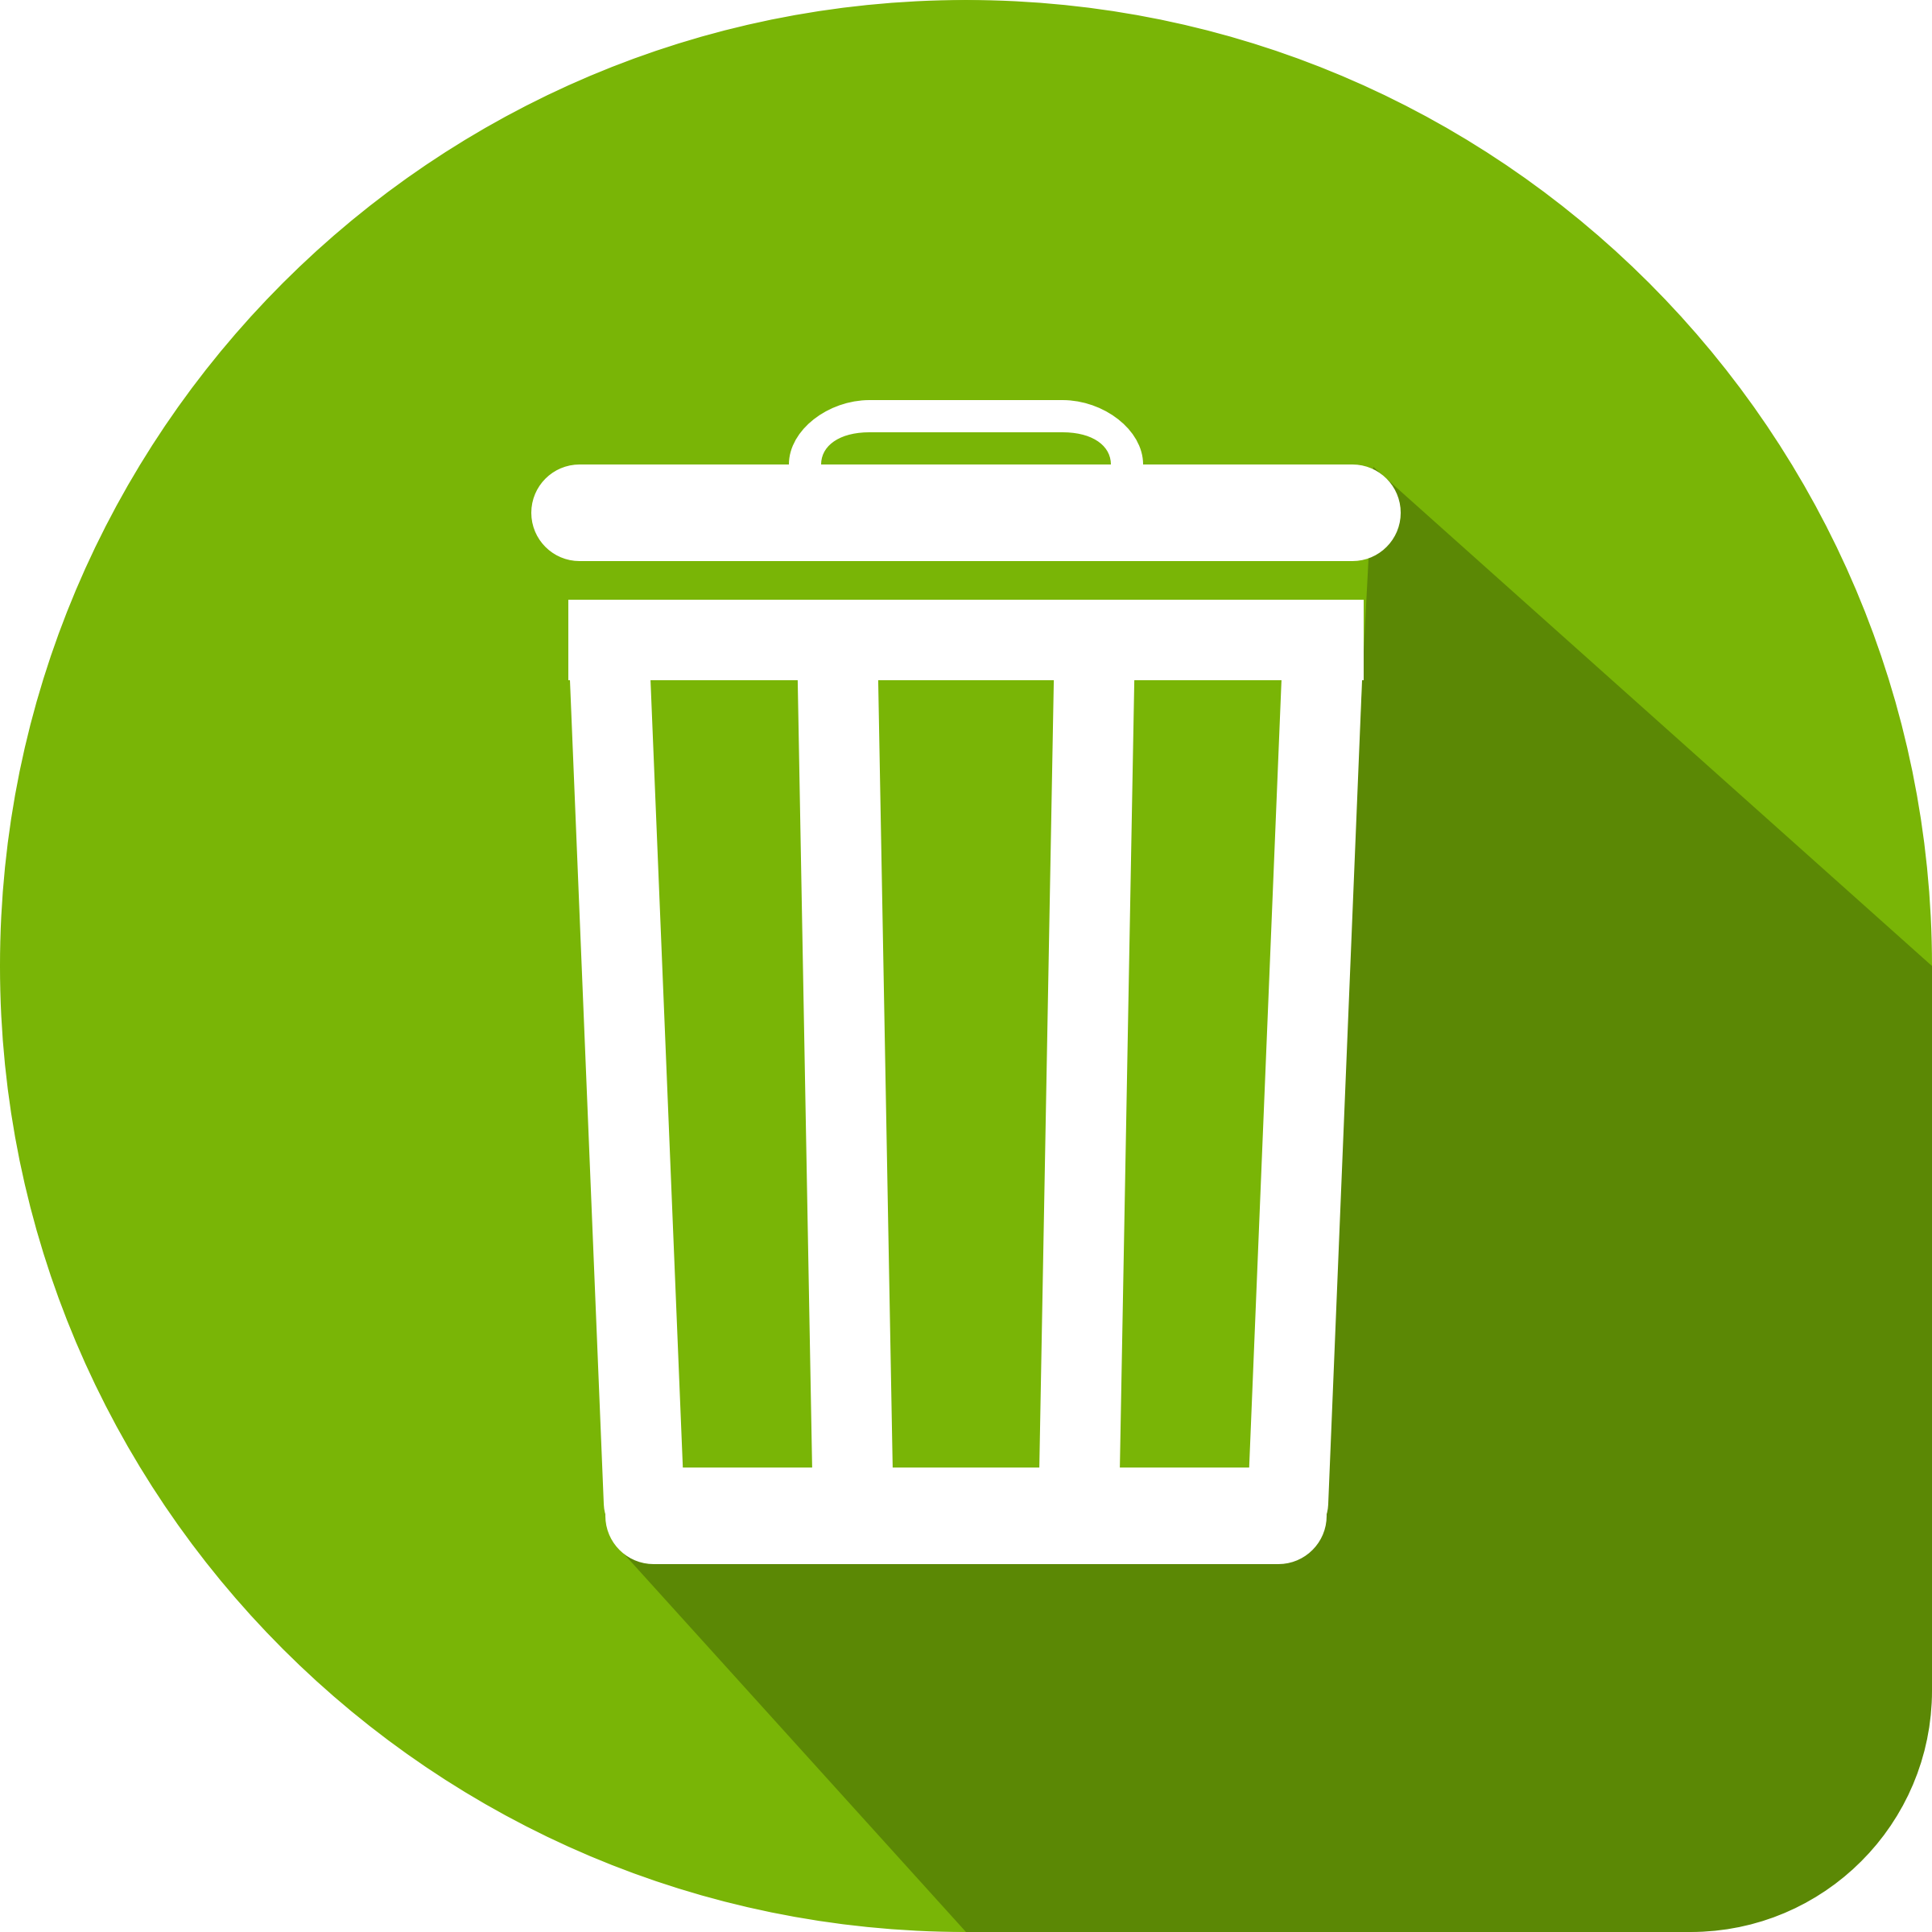 Recycle Bin Trash PNG File